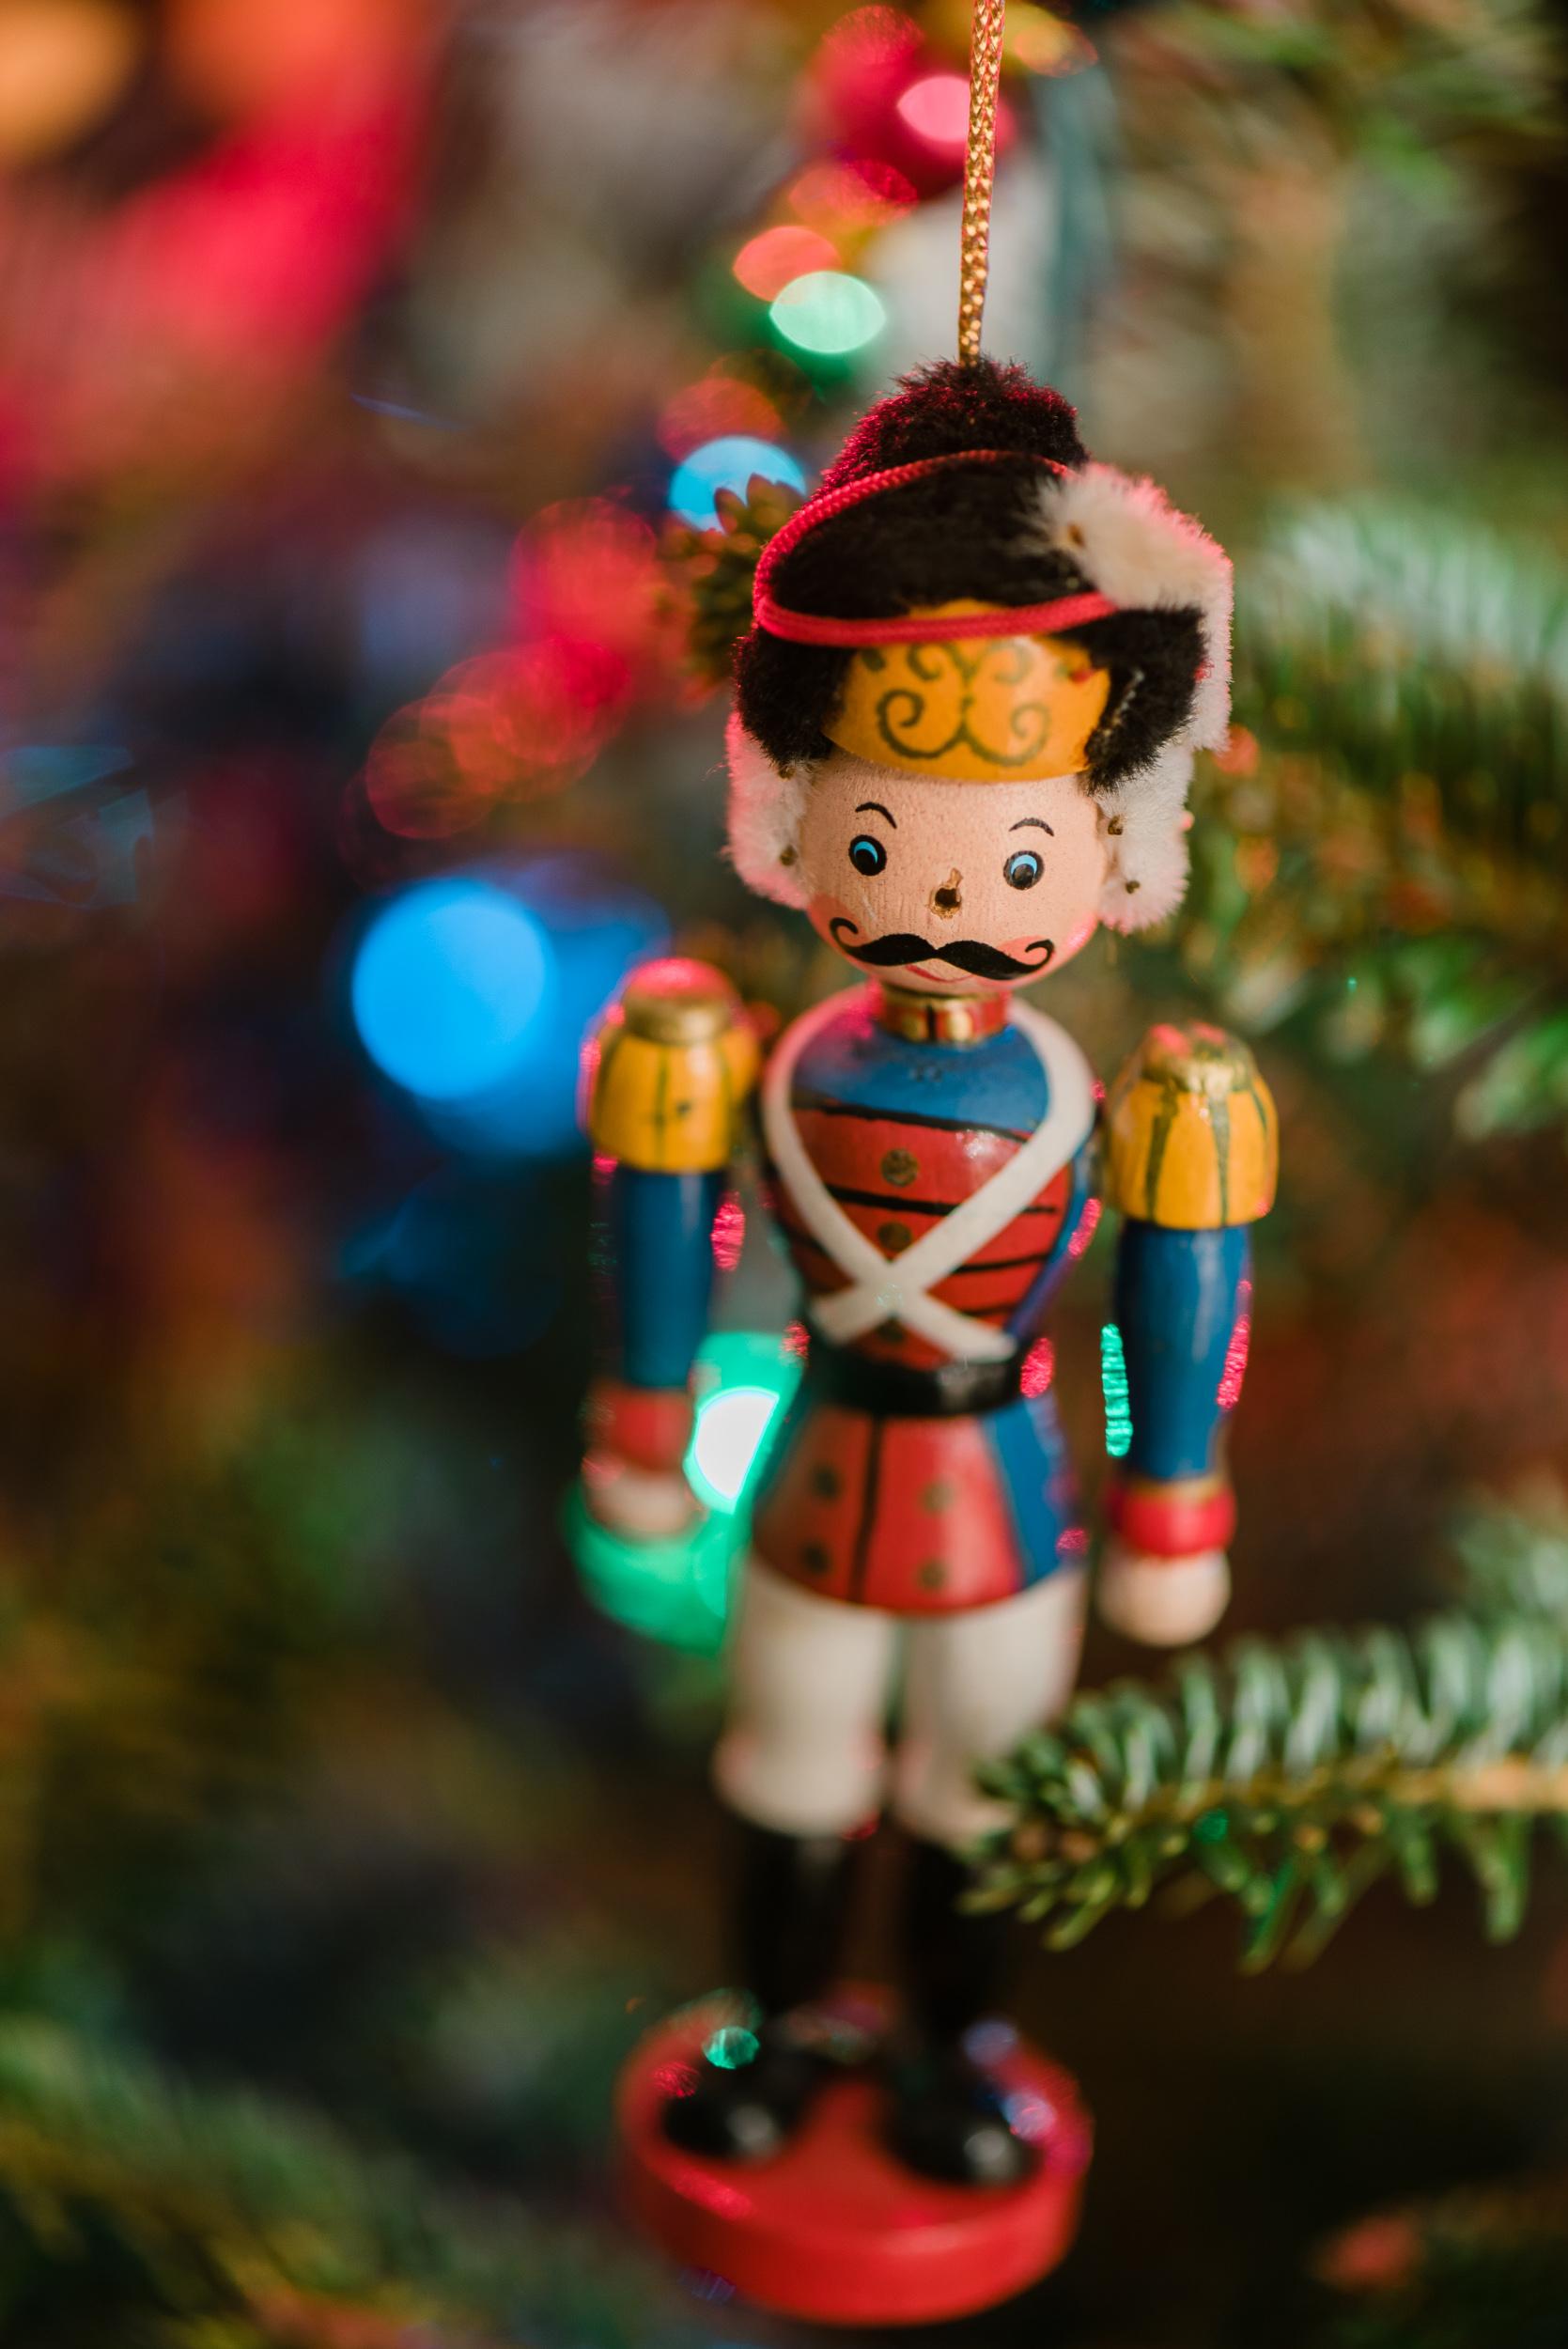 Sentimental-Christmas-Tree-Ornament-Toy-Soldier-Sarah-Danielle-Portraits-Florida-Photographer